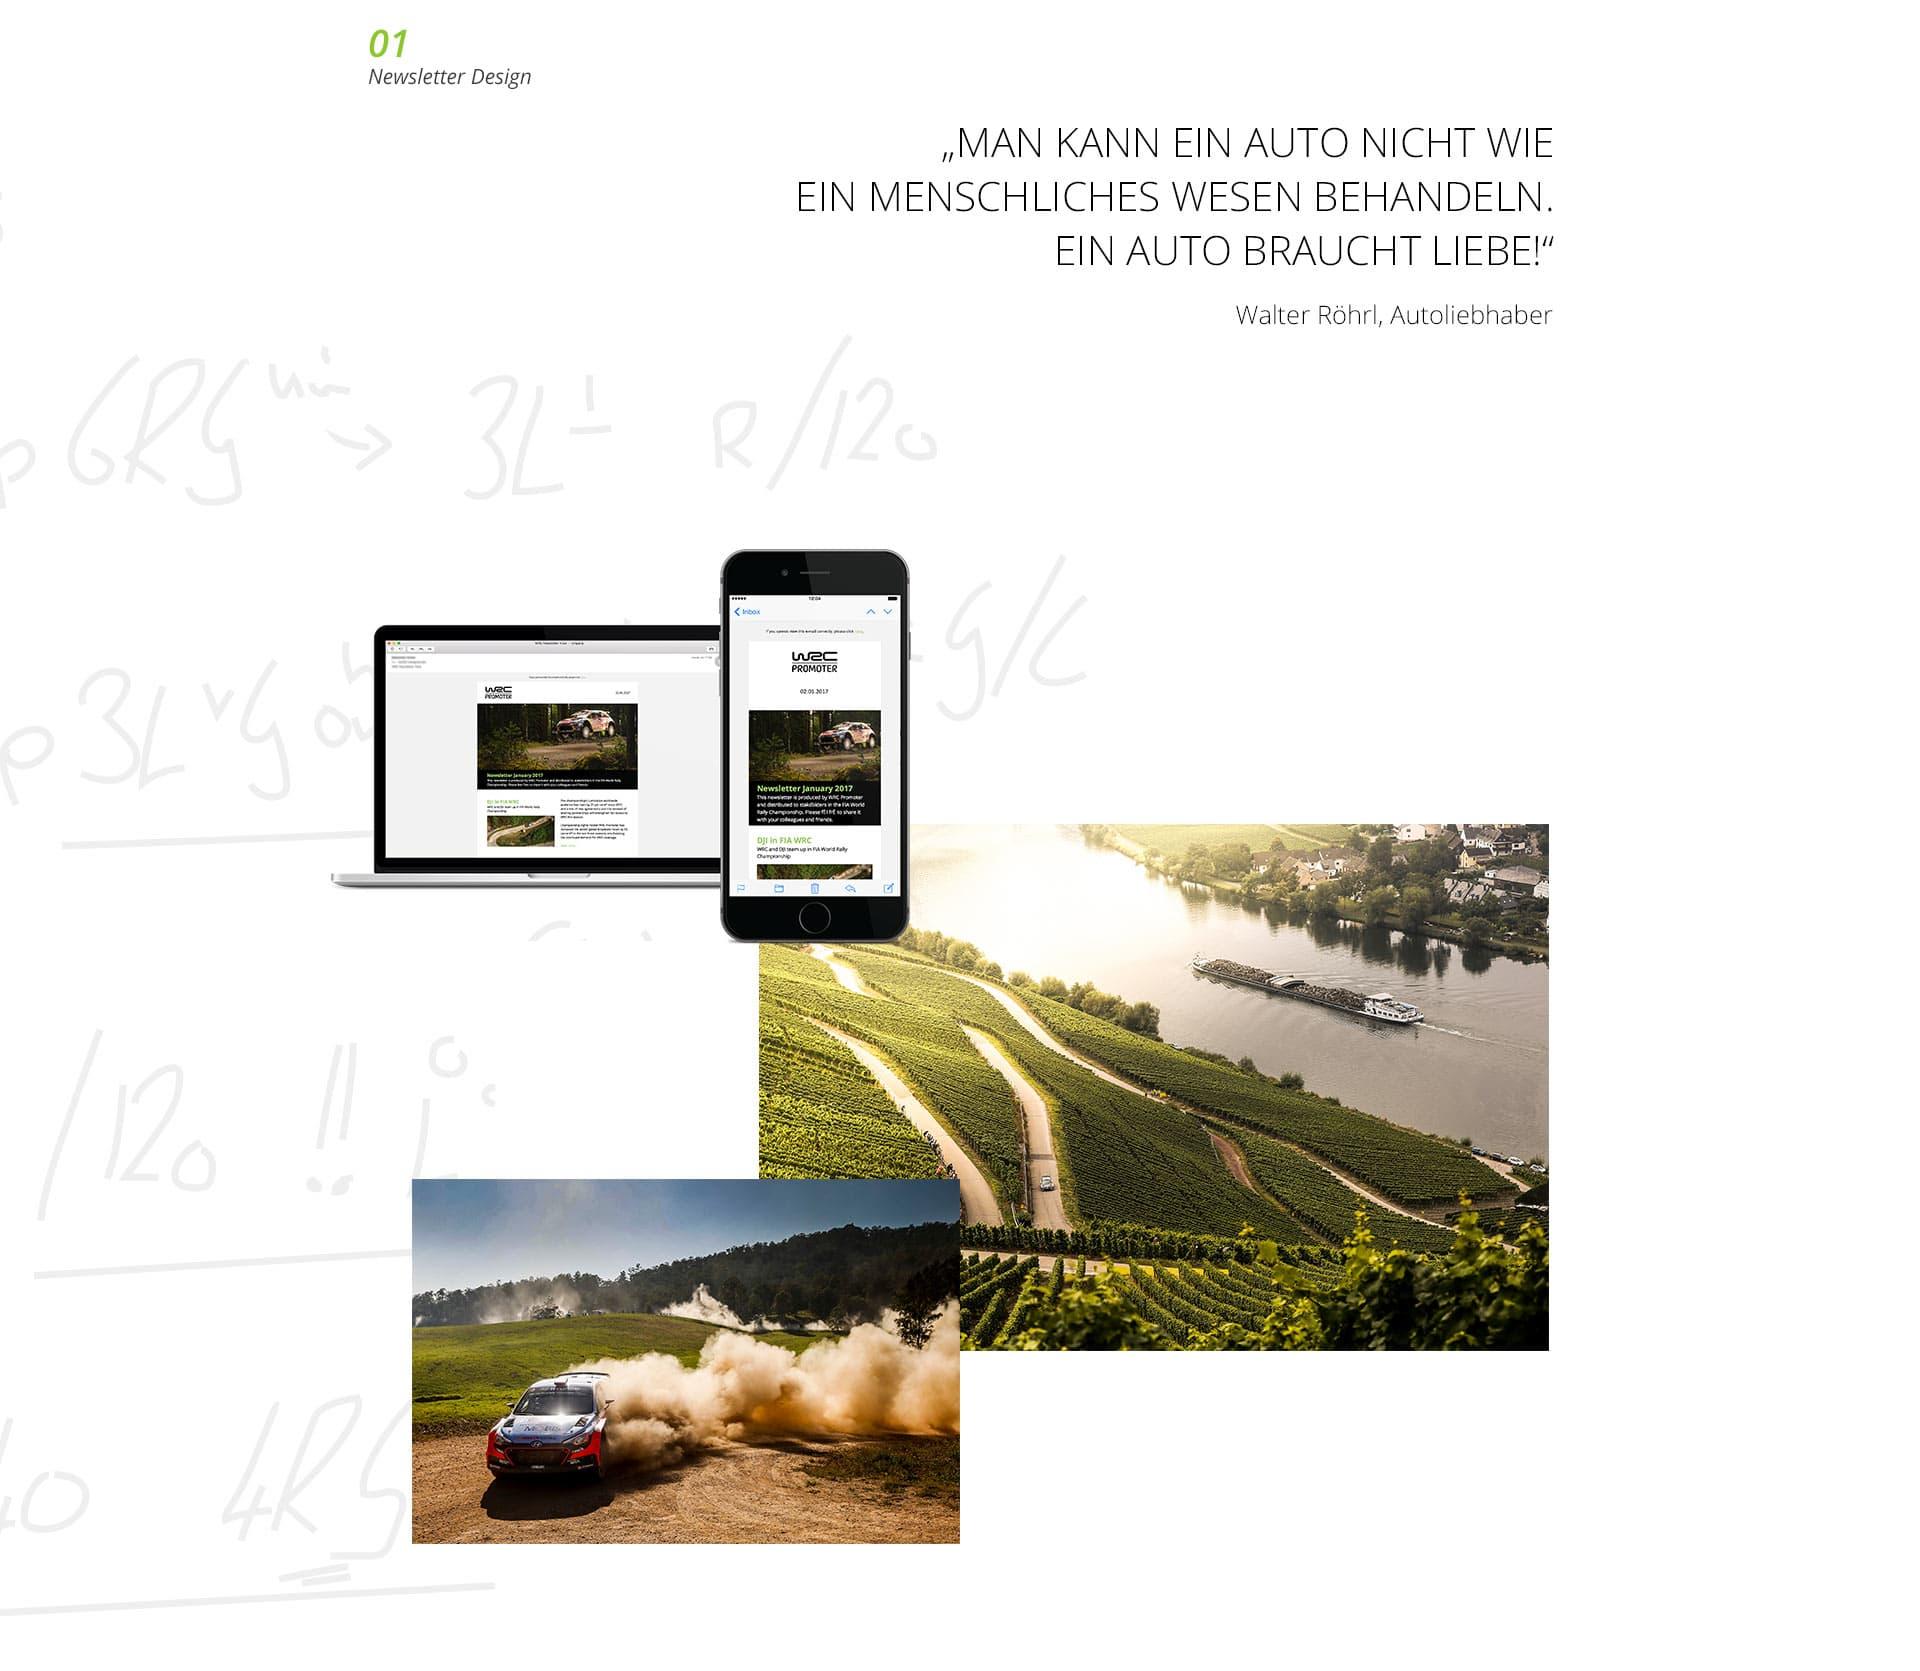 EAZEE Corporate Design WRC Newsletter Design